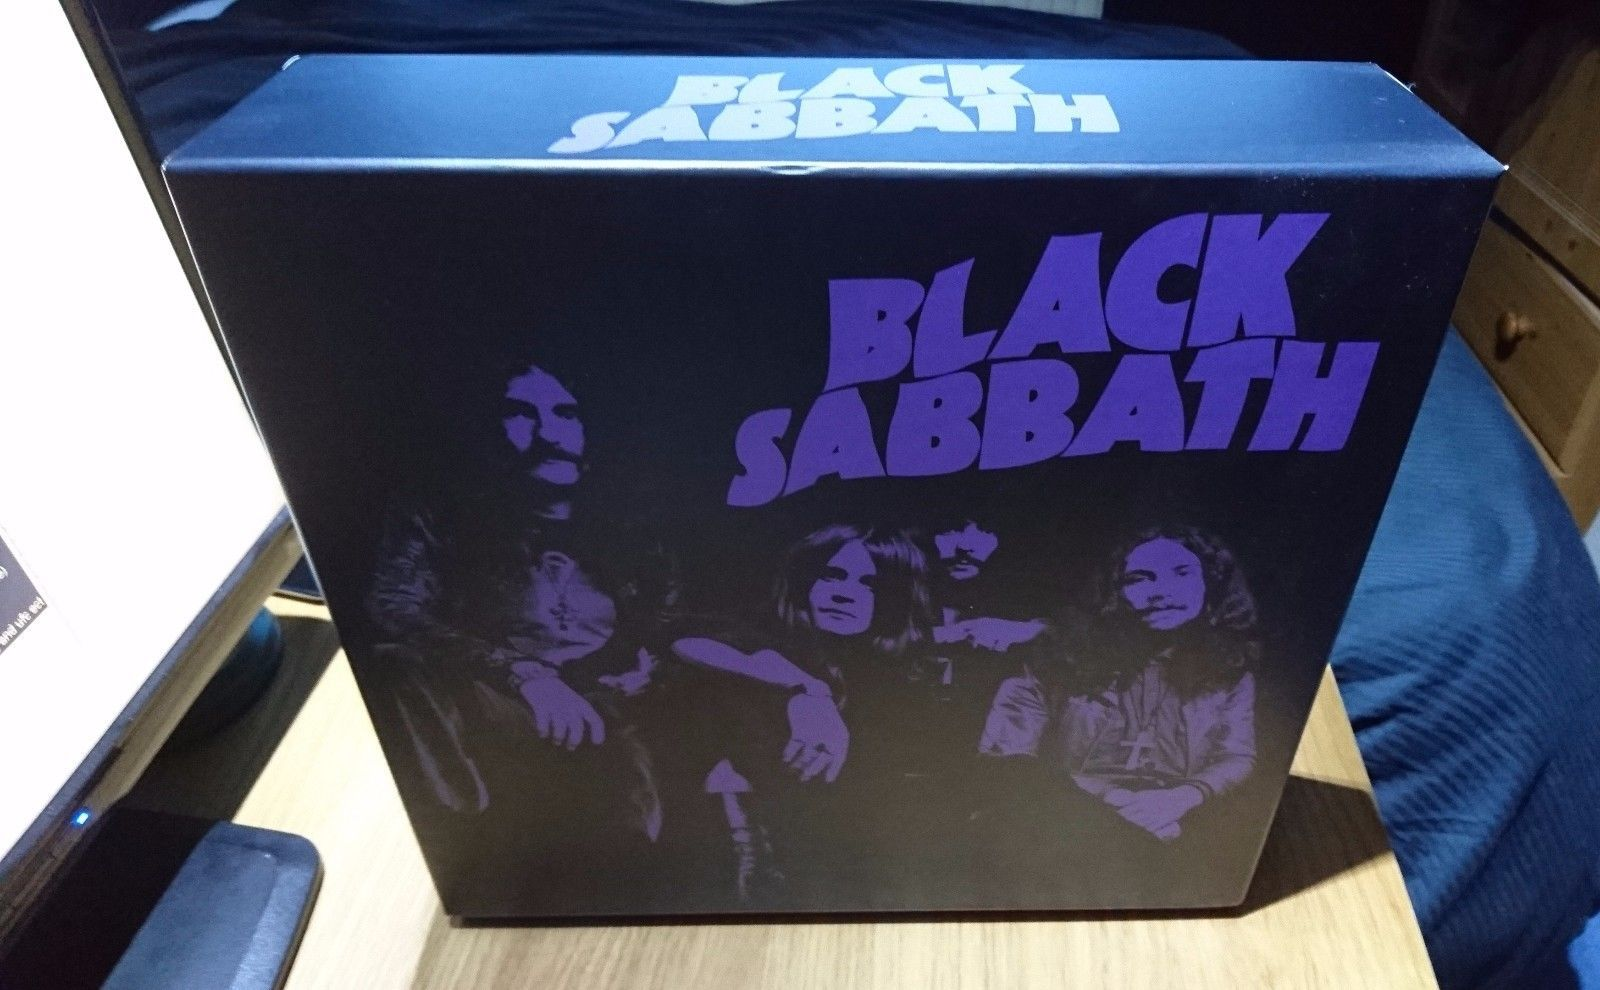 Black Sabbath Reissues With Gatefold Sleeves And Colored Vinyl Black Sabbath Master Of Reality Vinyl